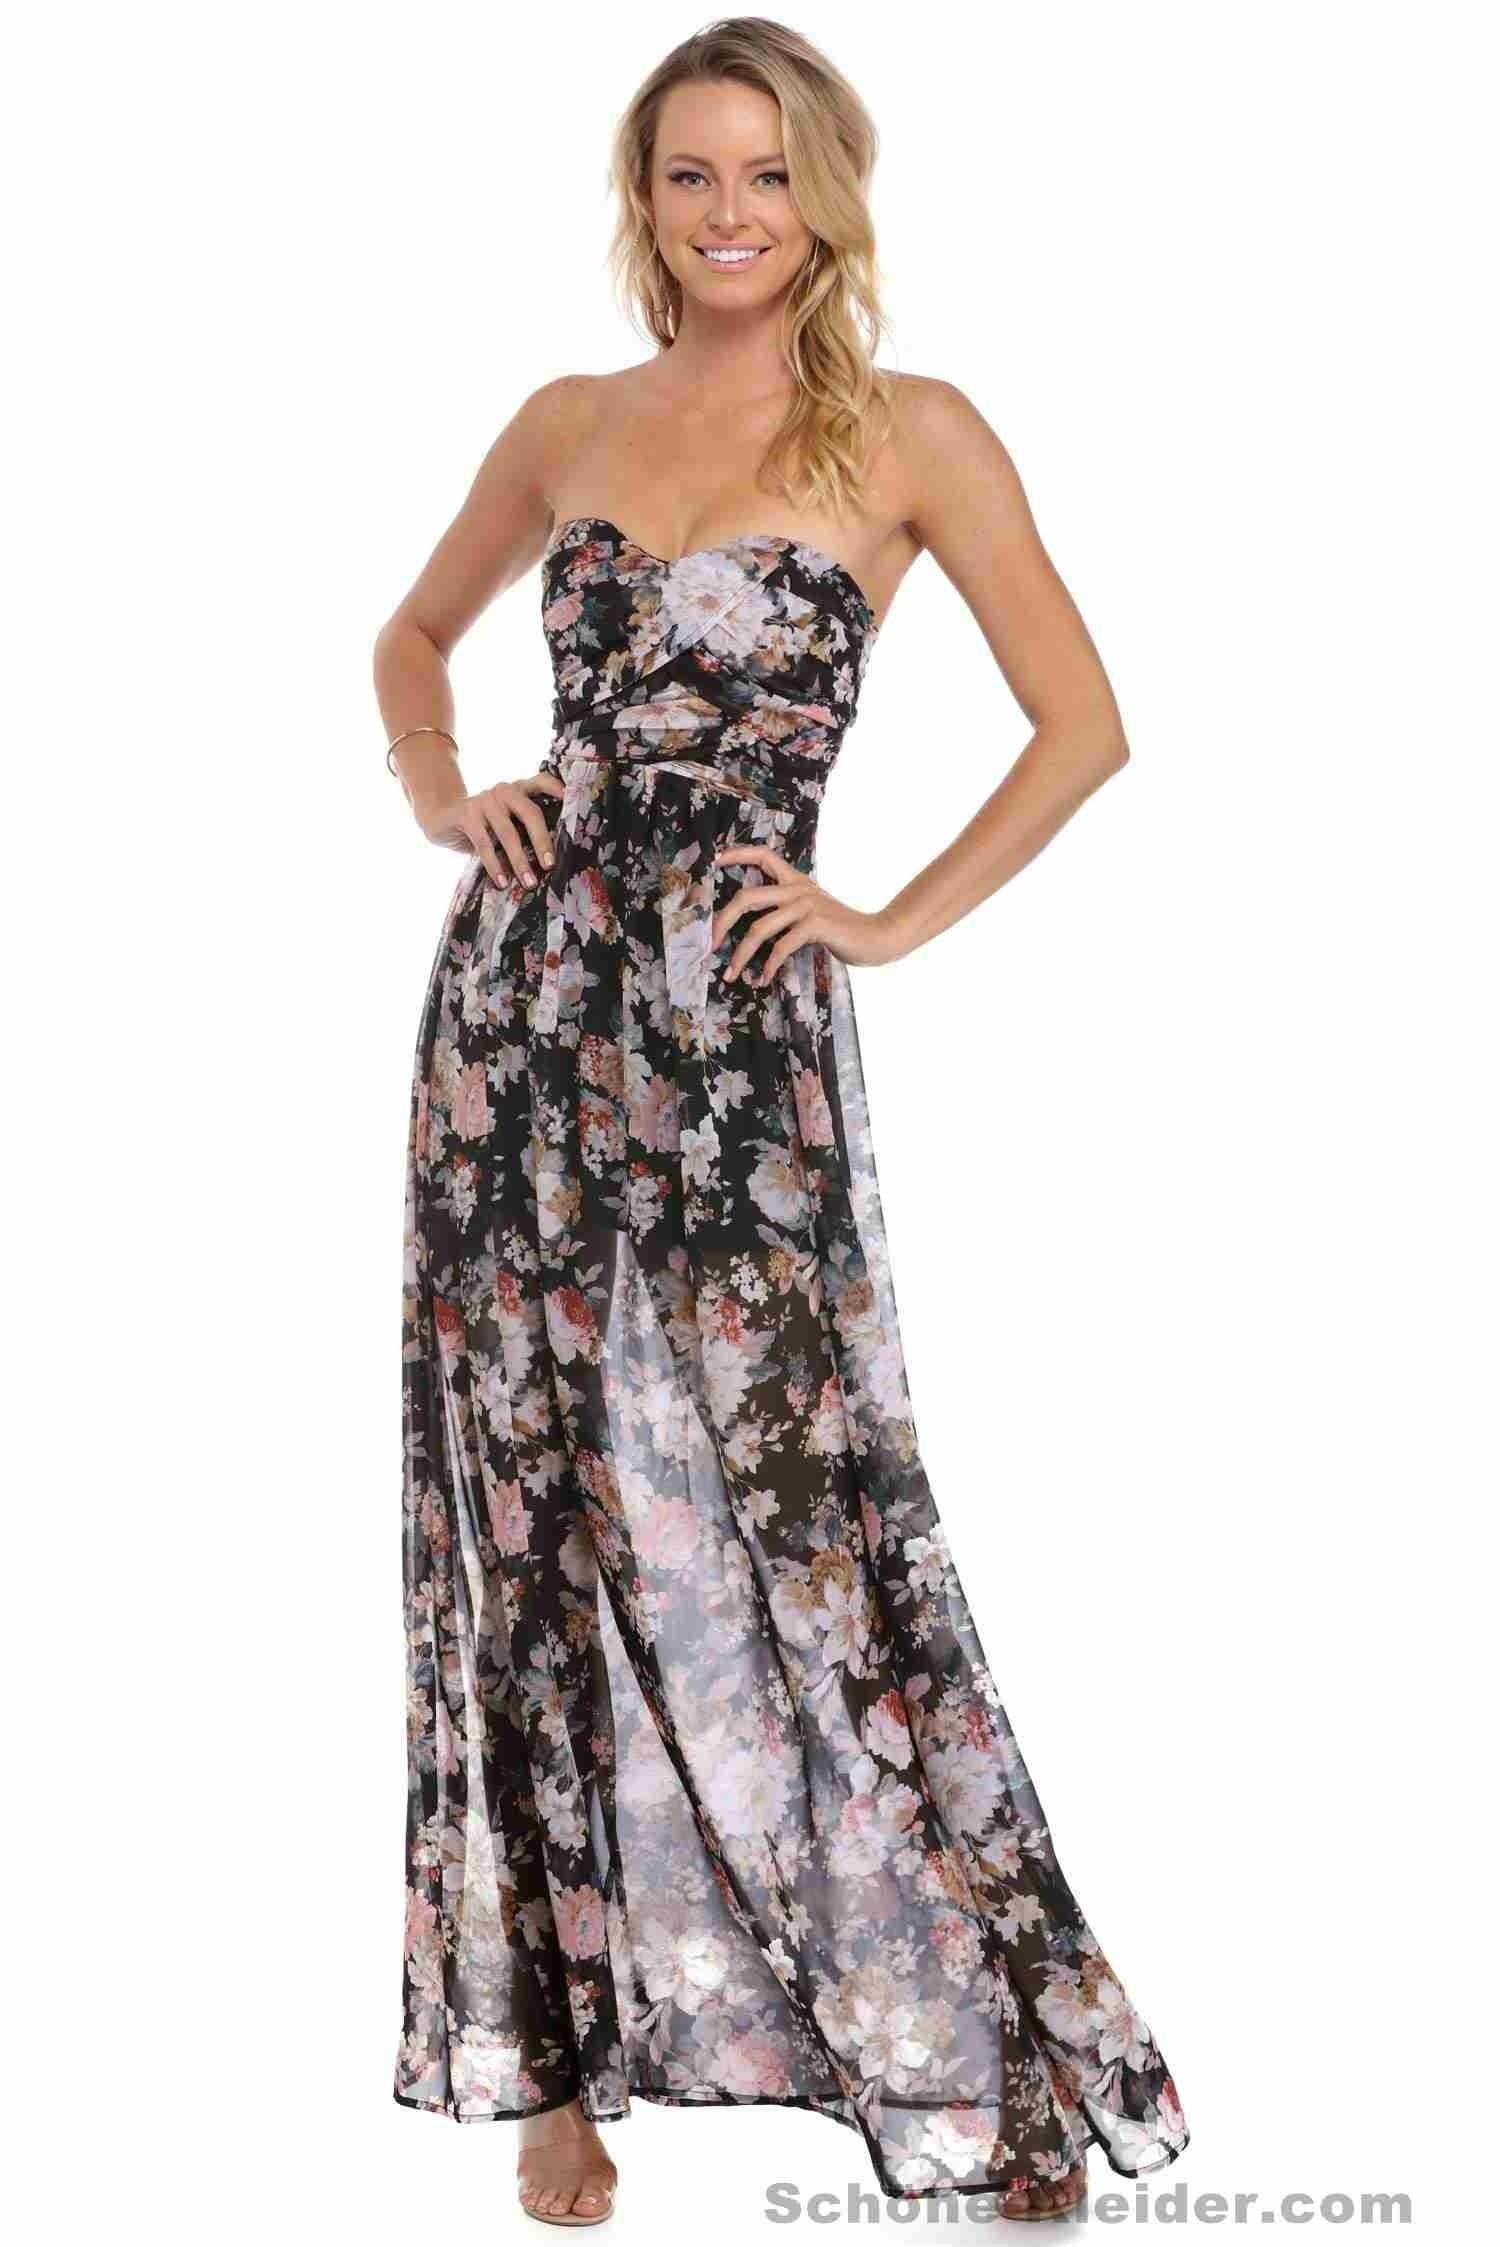 Abend Cool Lange Elegante Sommerkleider DesignAbend Perfekt Lange Elegante Sommerkleider für 2019